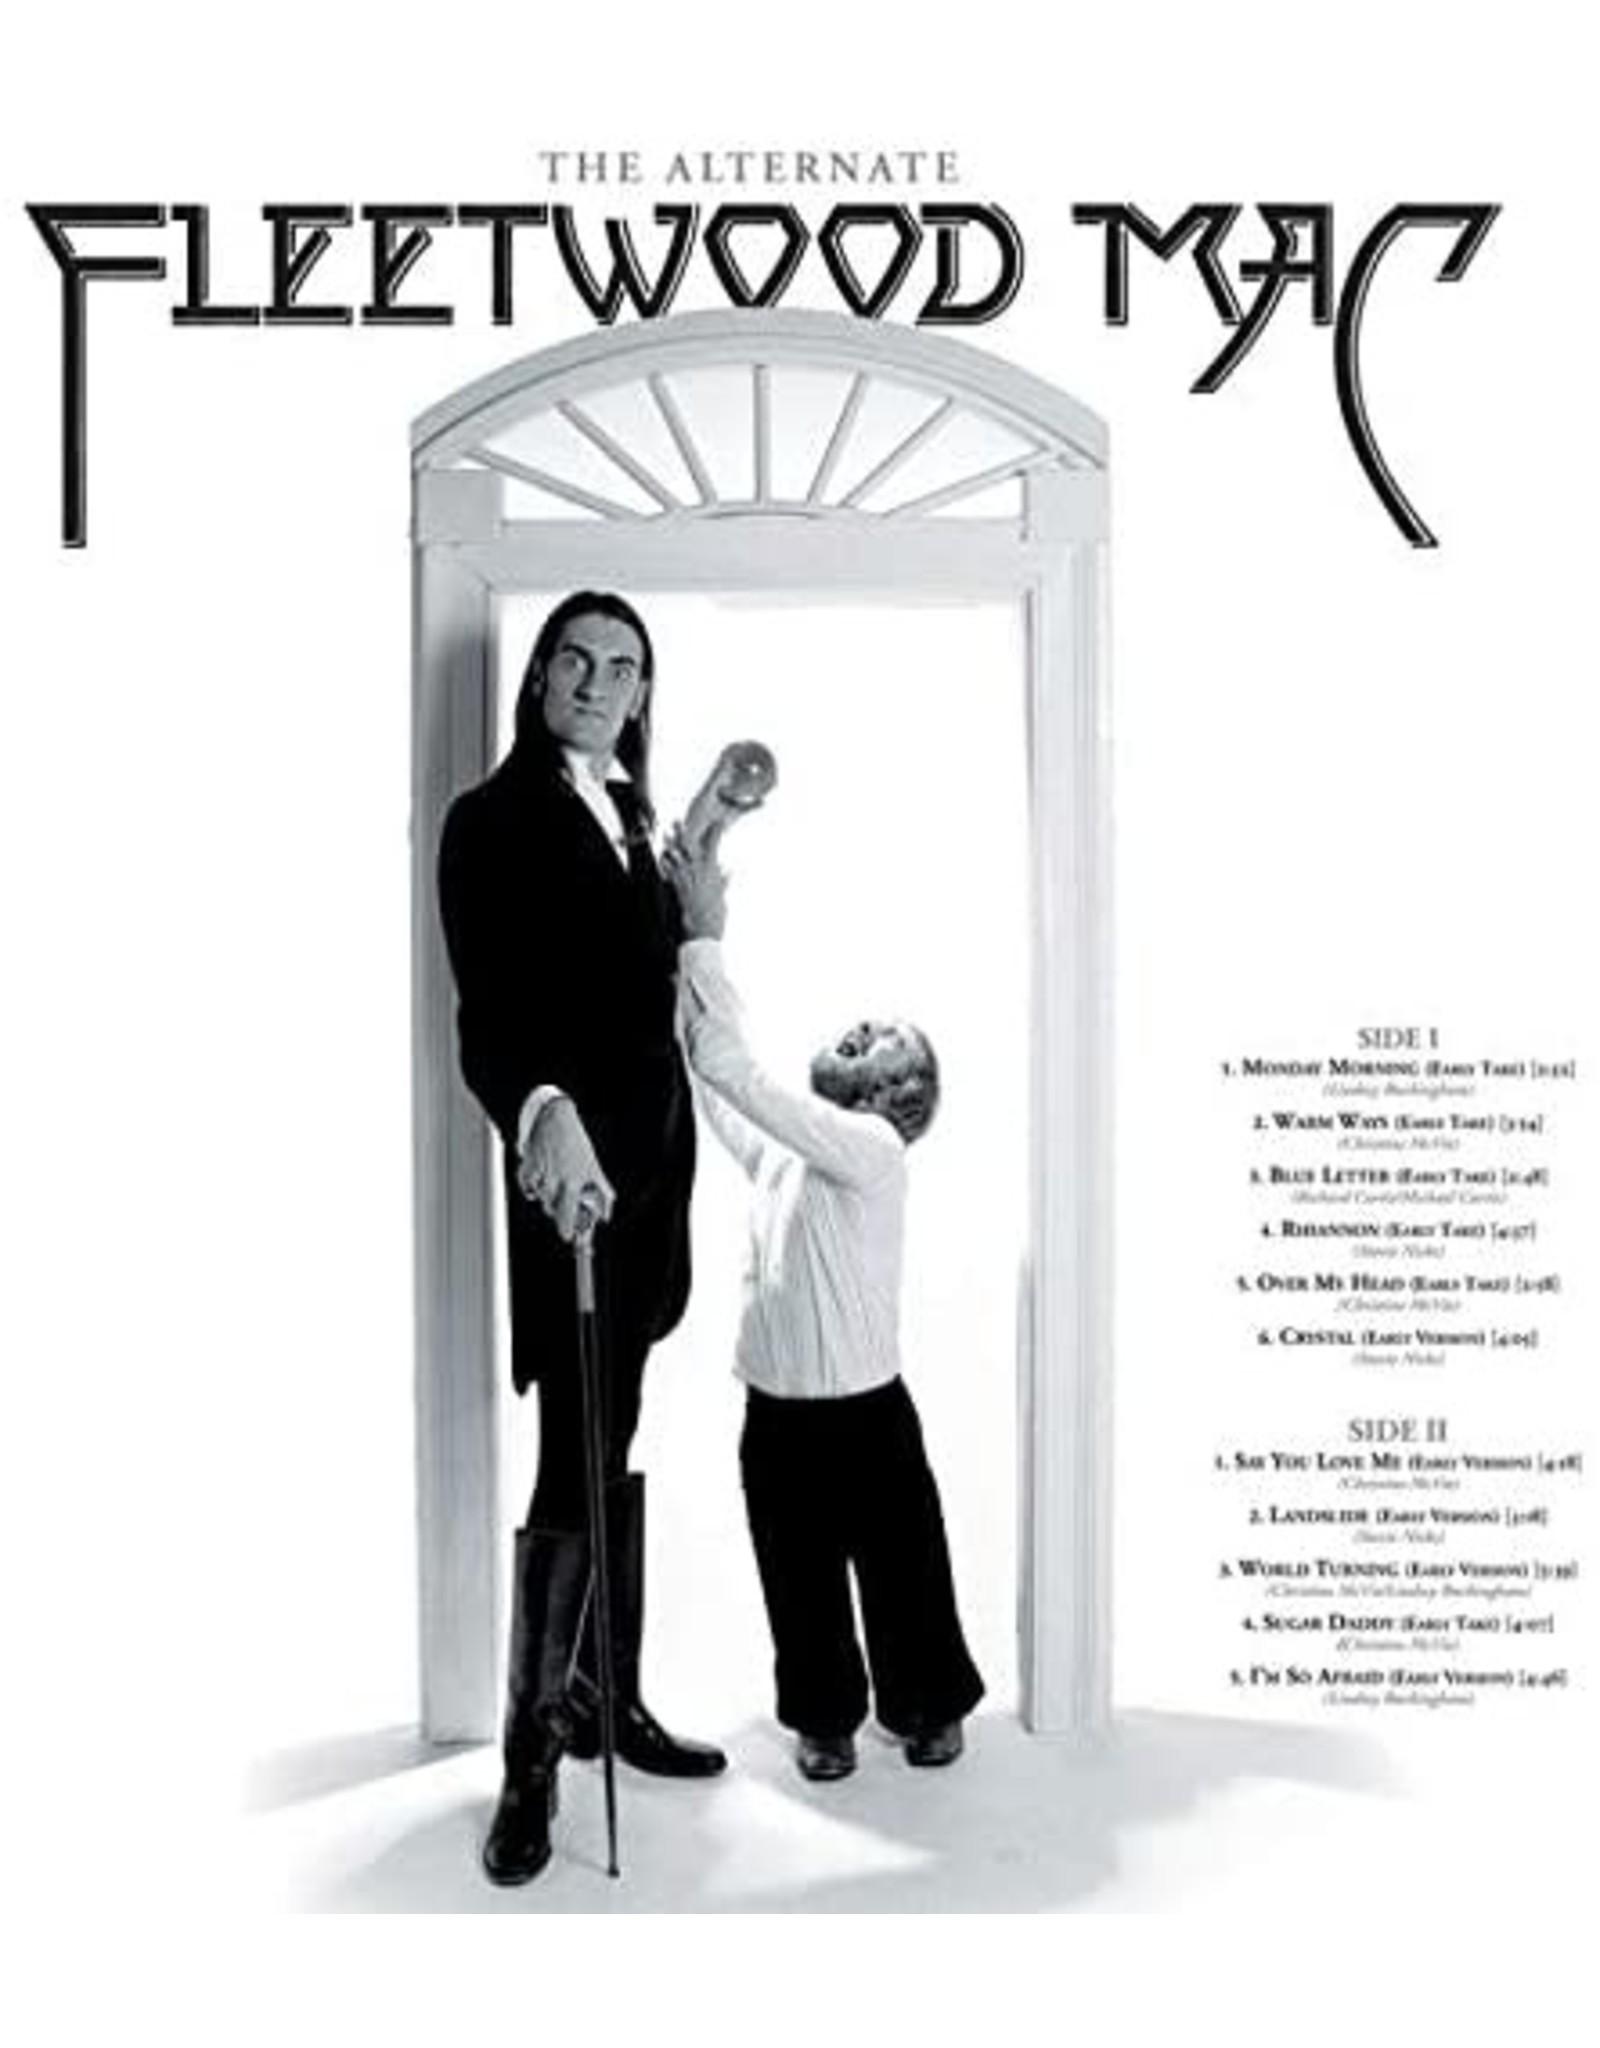 Fleetwood Mac - Alternate Fleetwood Mac (Record Store Day)